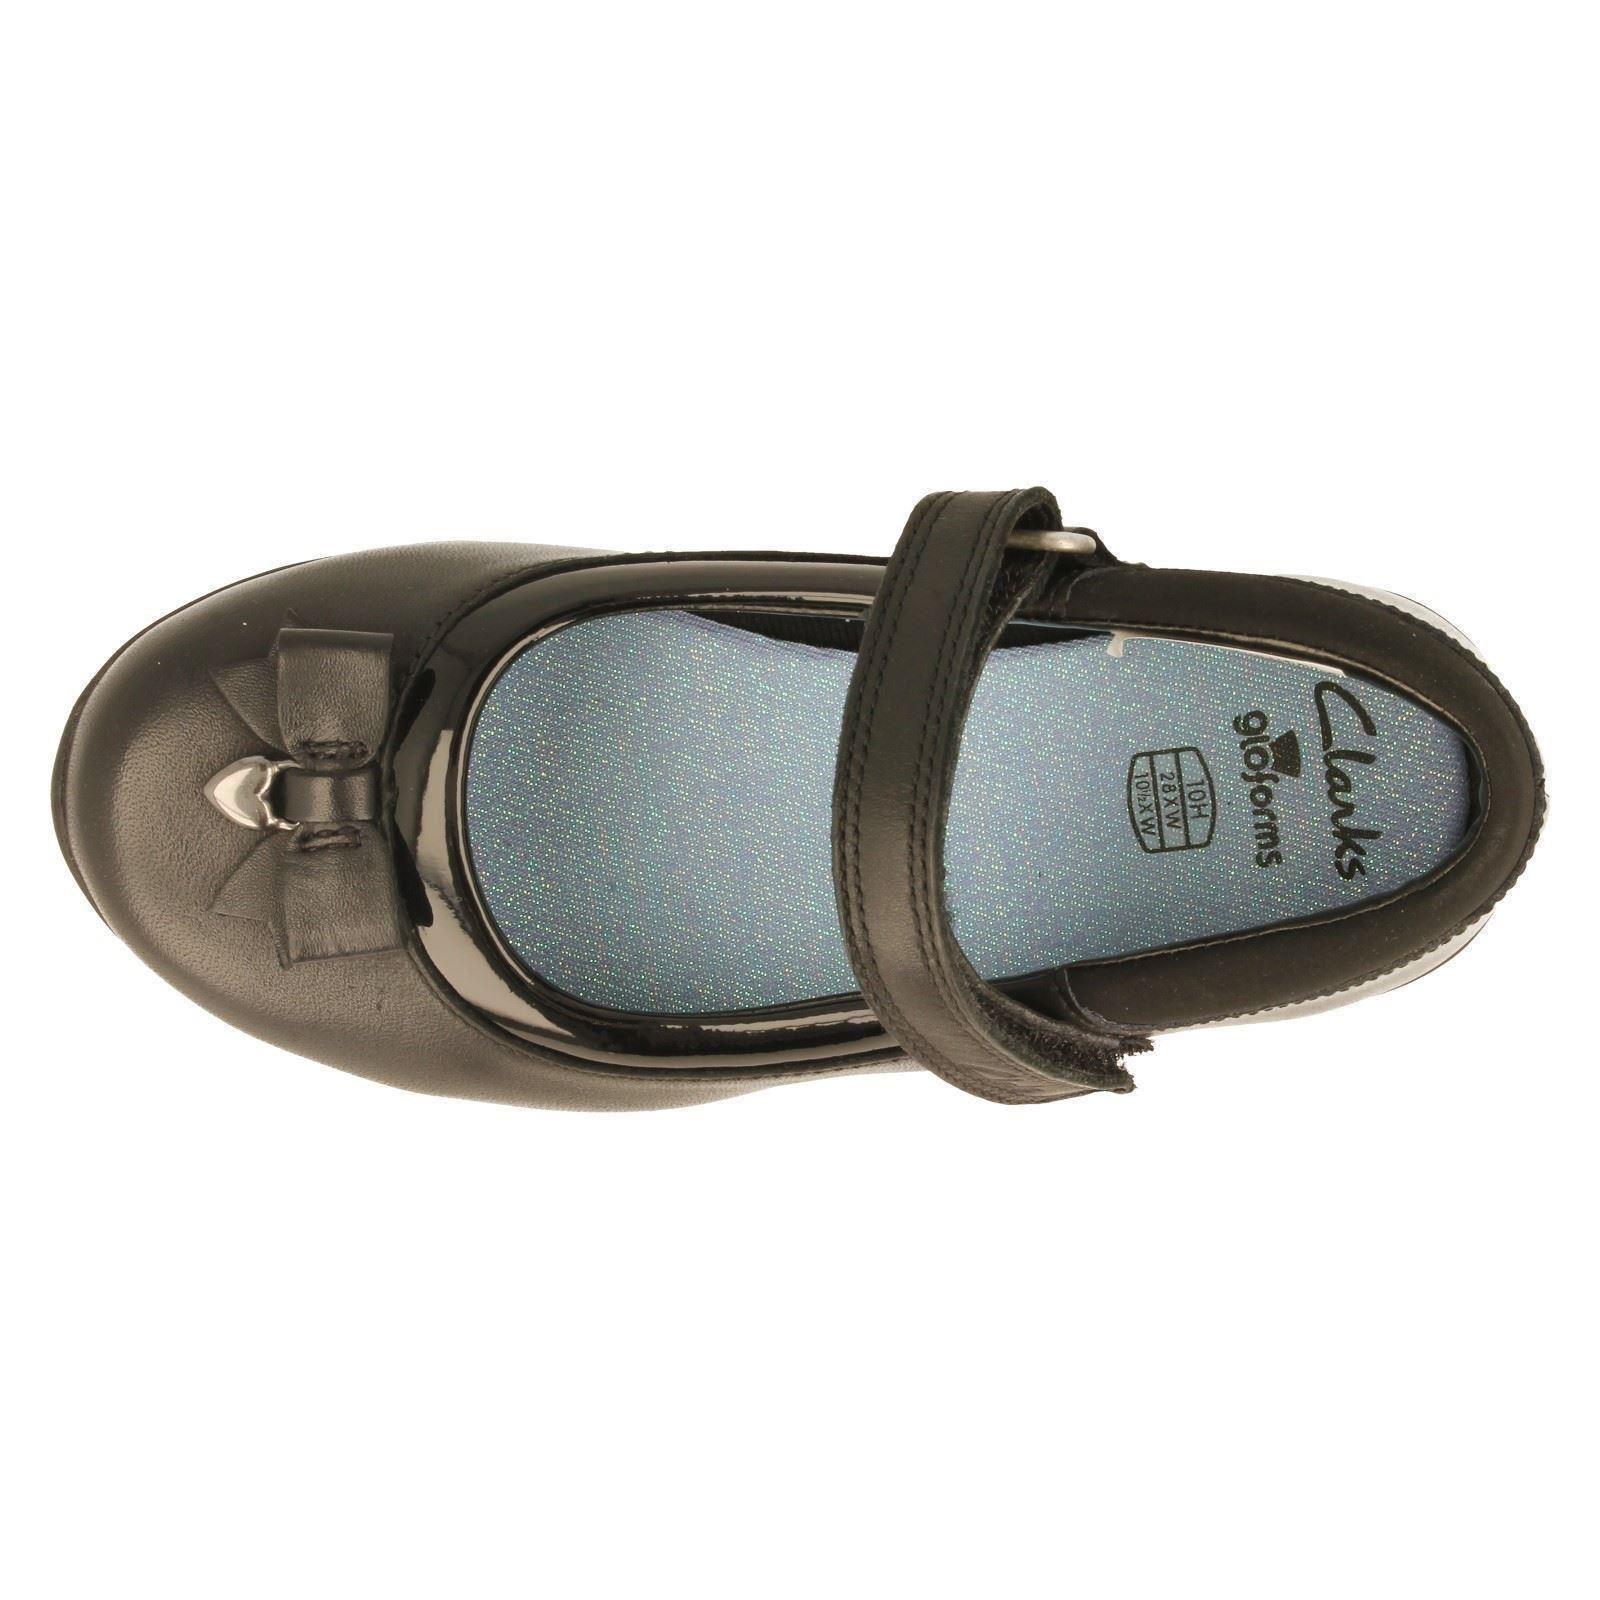 Clarks Zapatos de chicas gloforms estilo Ting fiebre-W